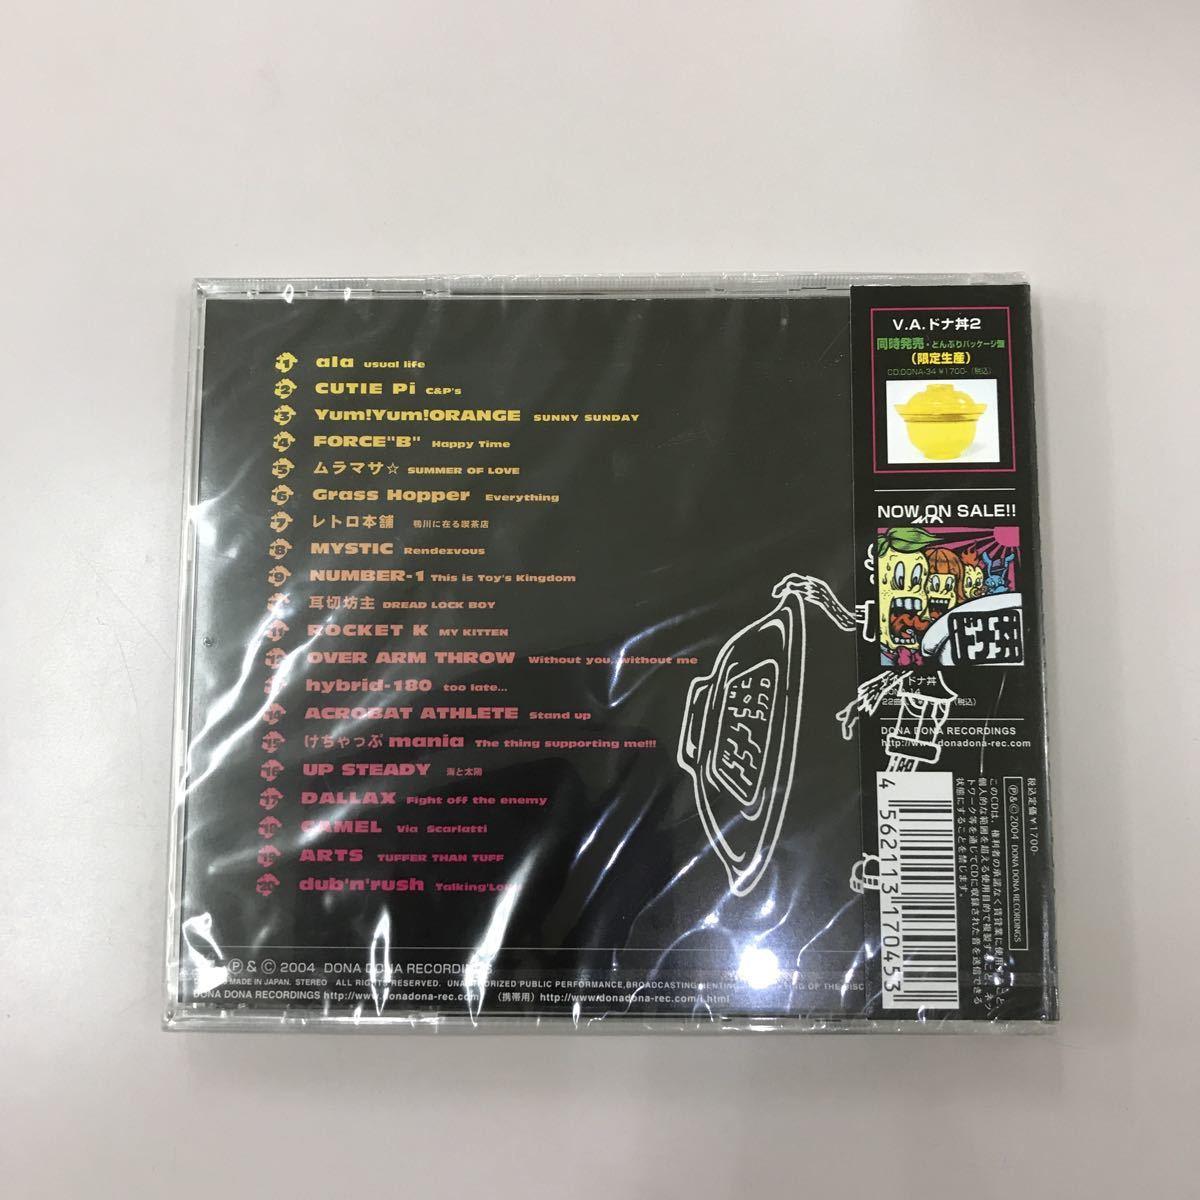 CD 新品未開封 長期保存品【邦楽】VA ドナ丼2